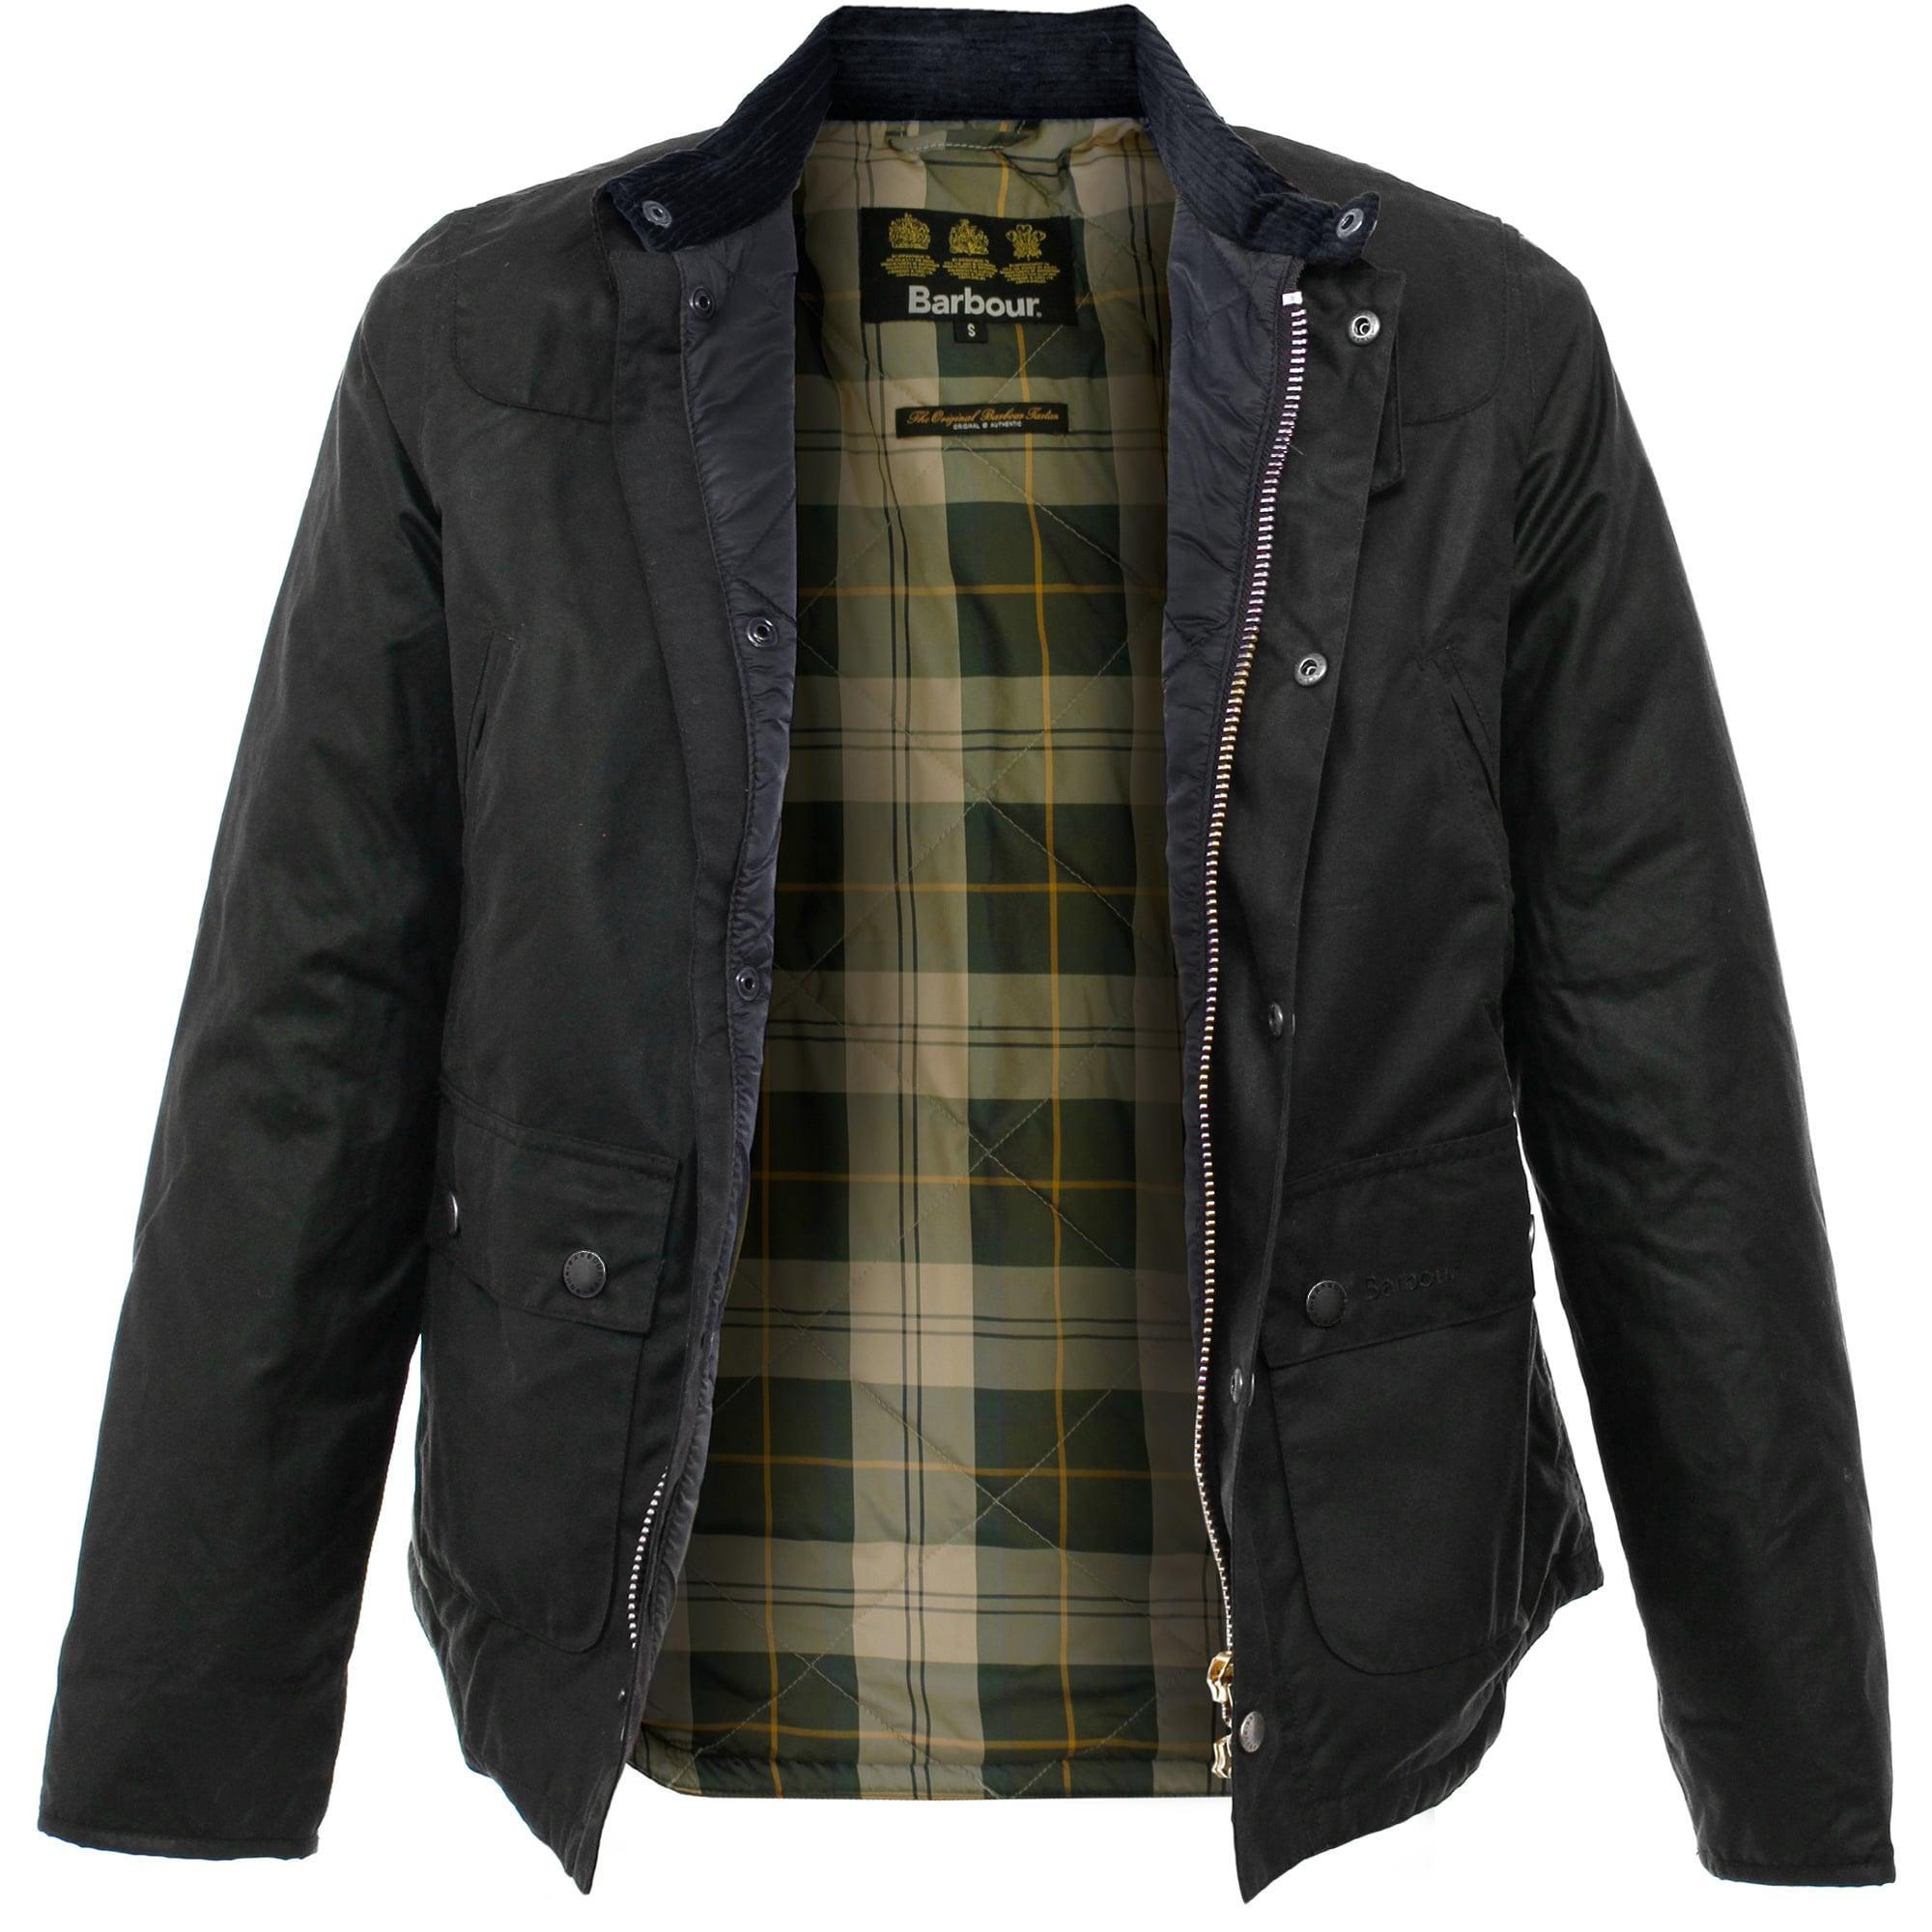 North Face Black Jacket